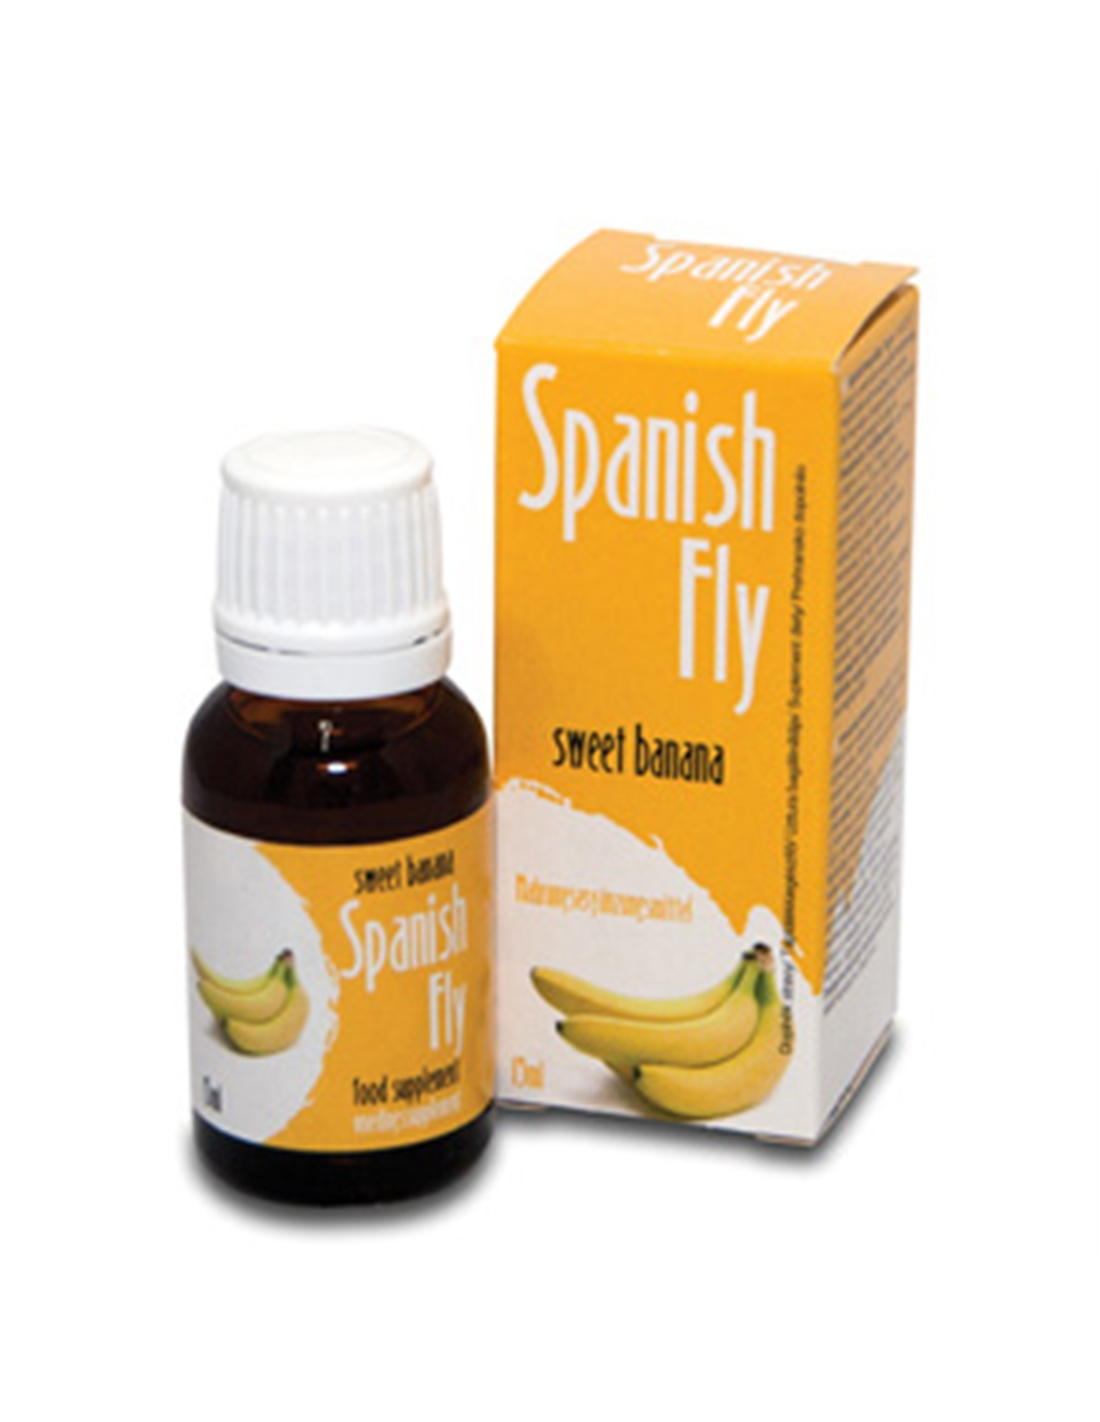 Gotas Spanish Fly Banana - 15ml - PR2010301540